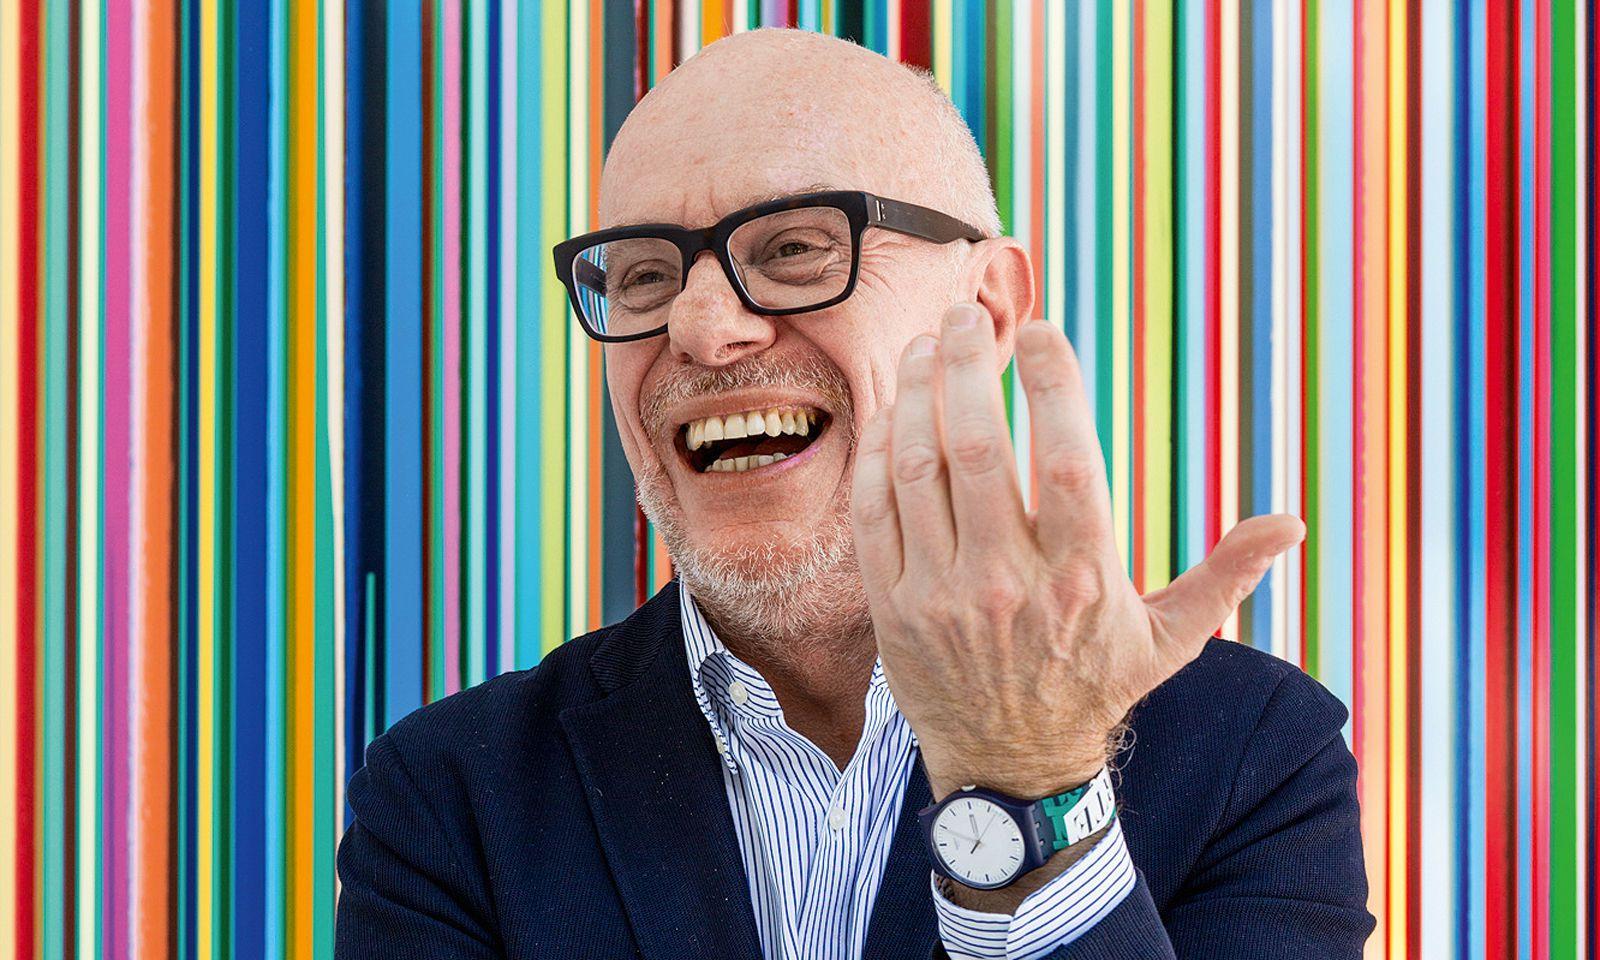 Visionär. Carlo Giordanetti ist seit 2012 Swatch-Kreativdirektor. busam doluptati bl